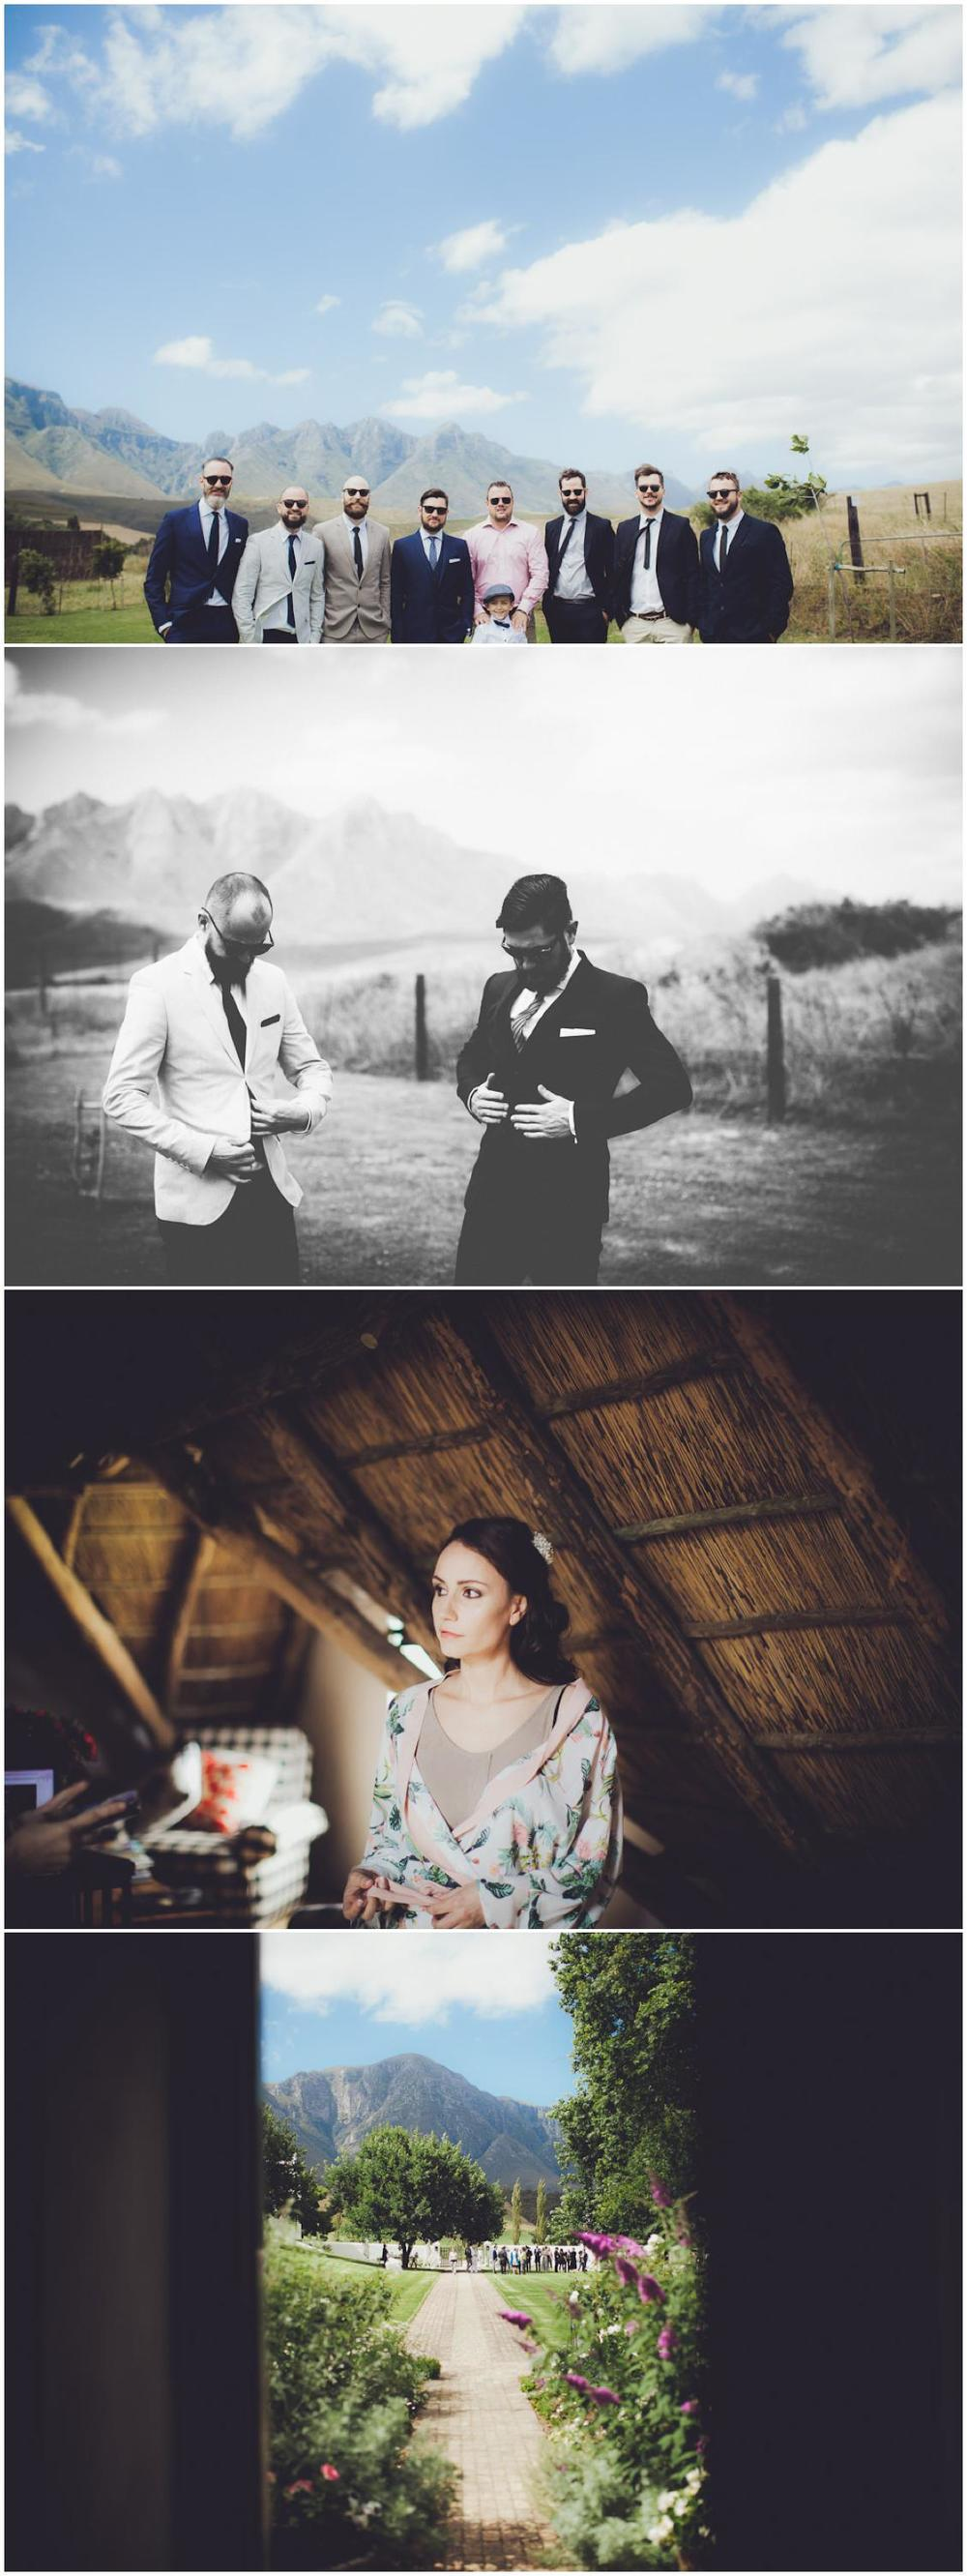 Ruan&Gina_TheOaks_FionaClairPhotography-32.jpg